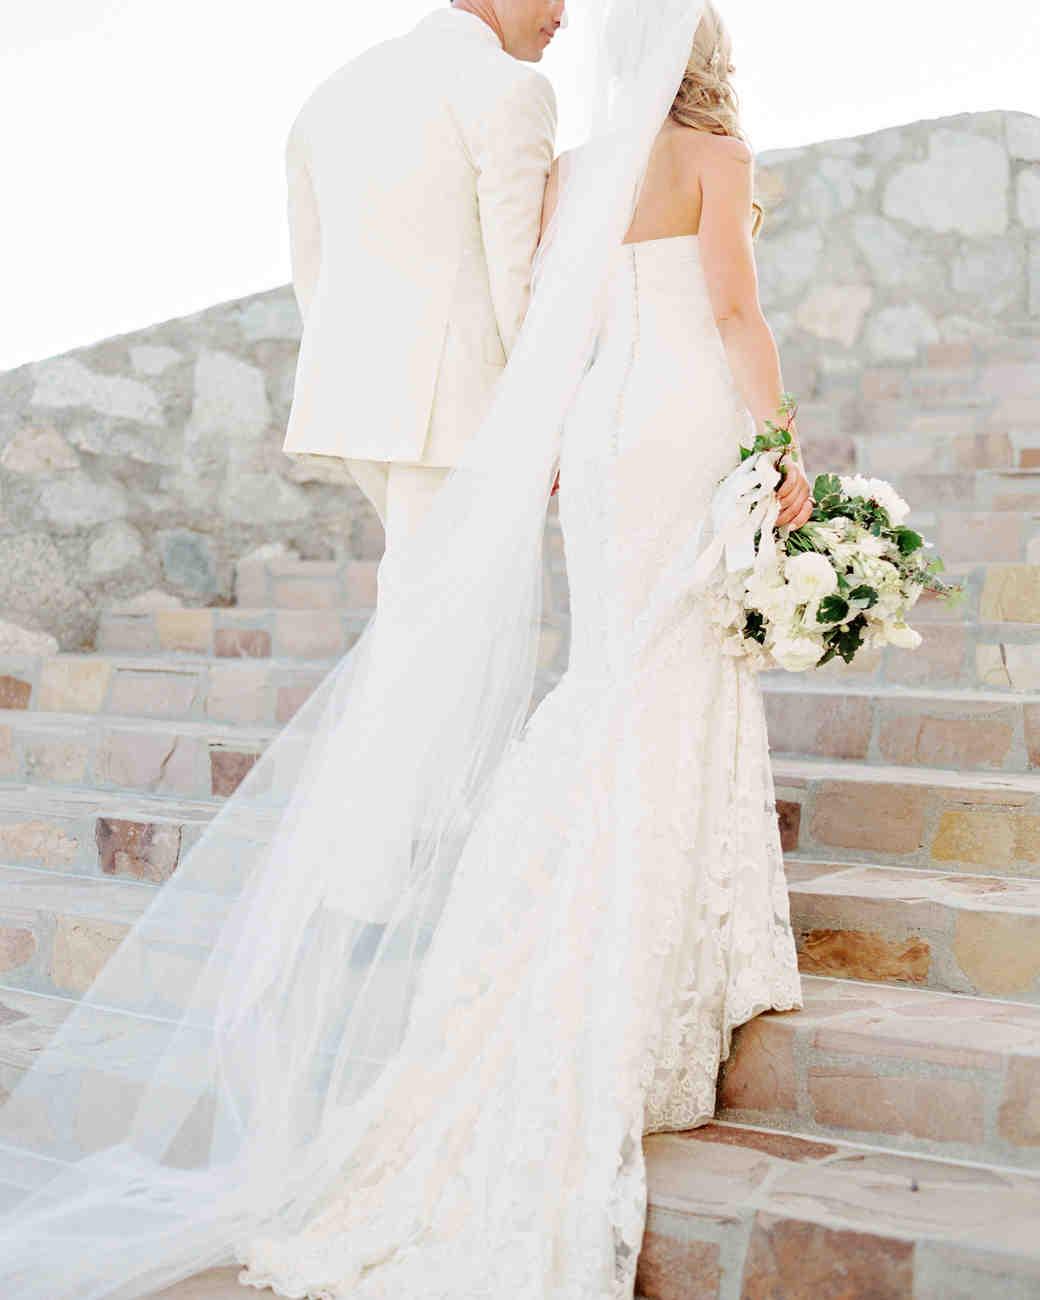 megan-jeremy-wedding-couple-68-s112680-0216.jpg